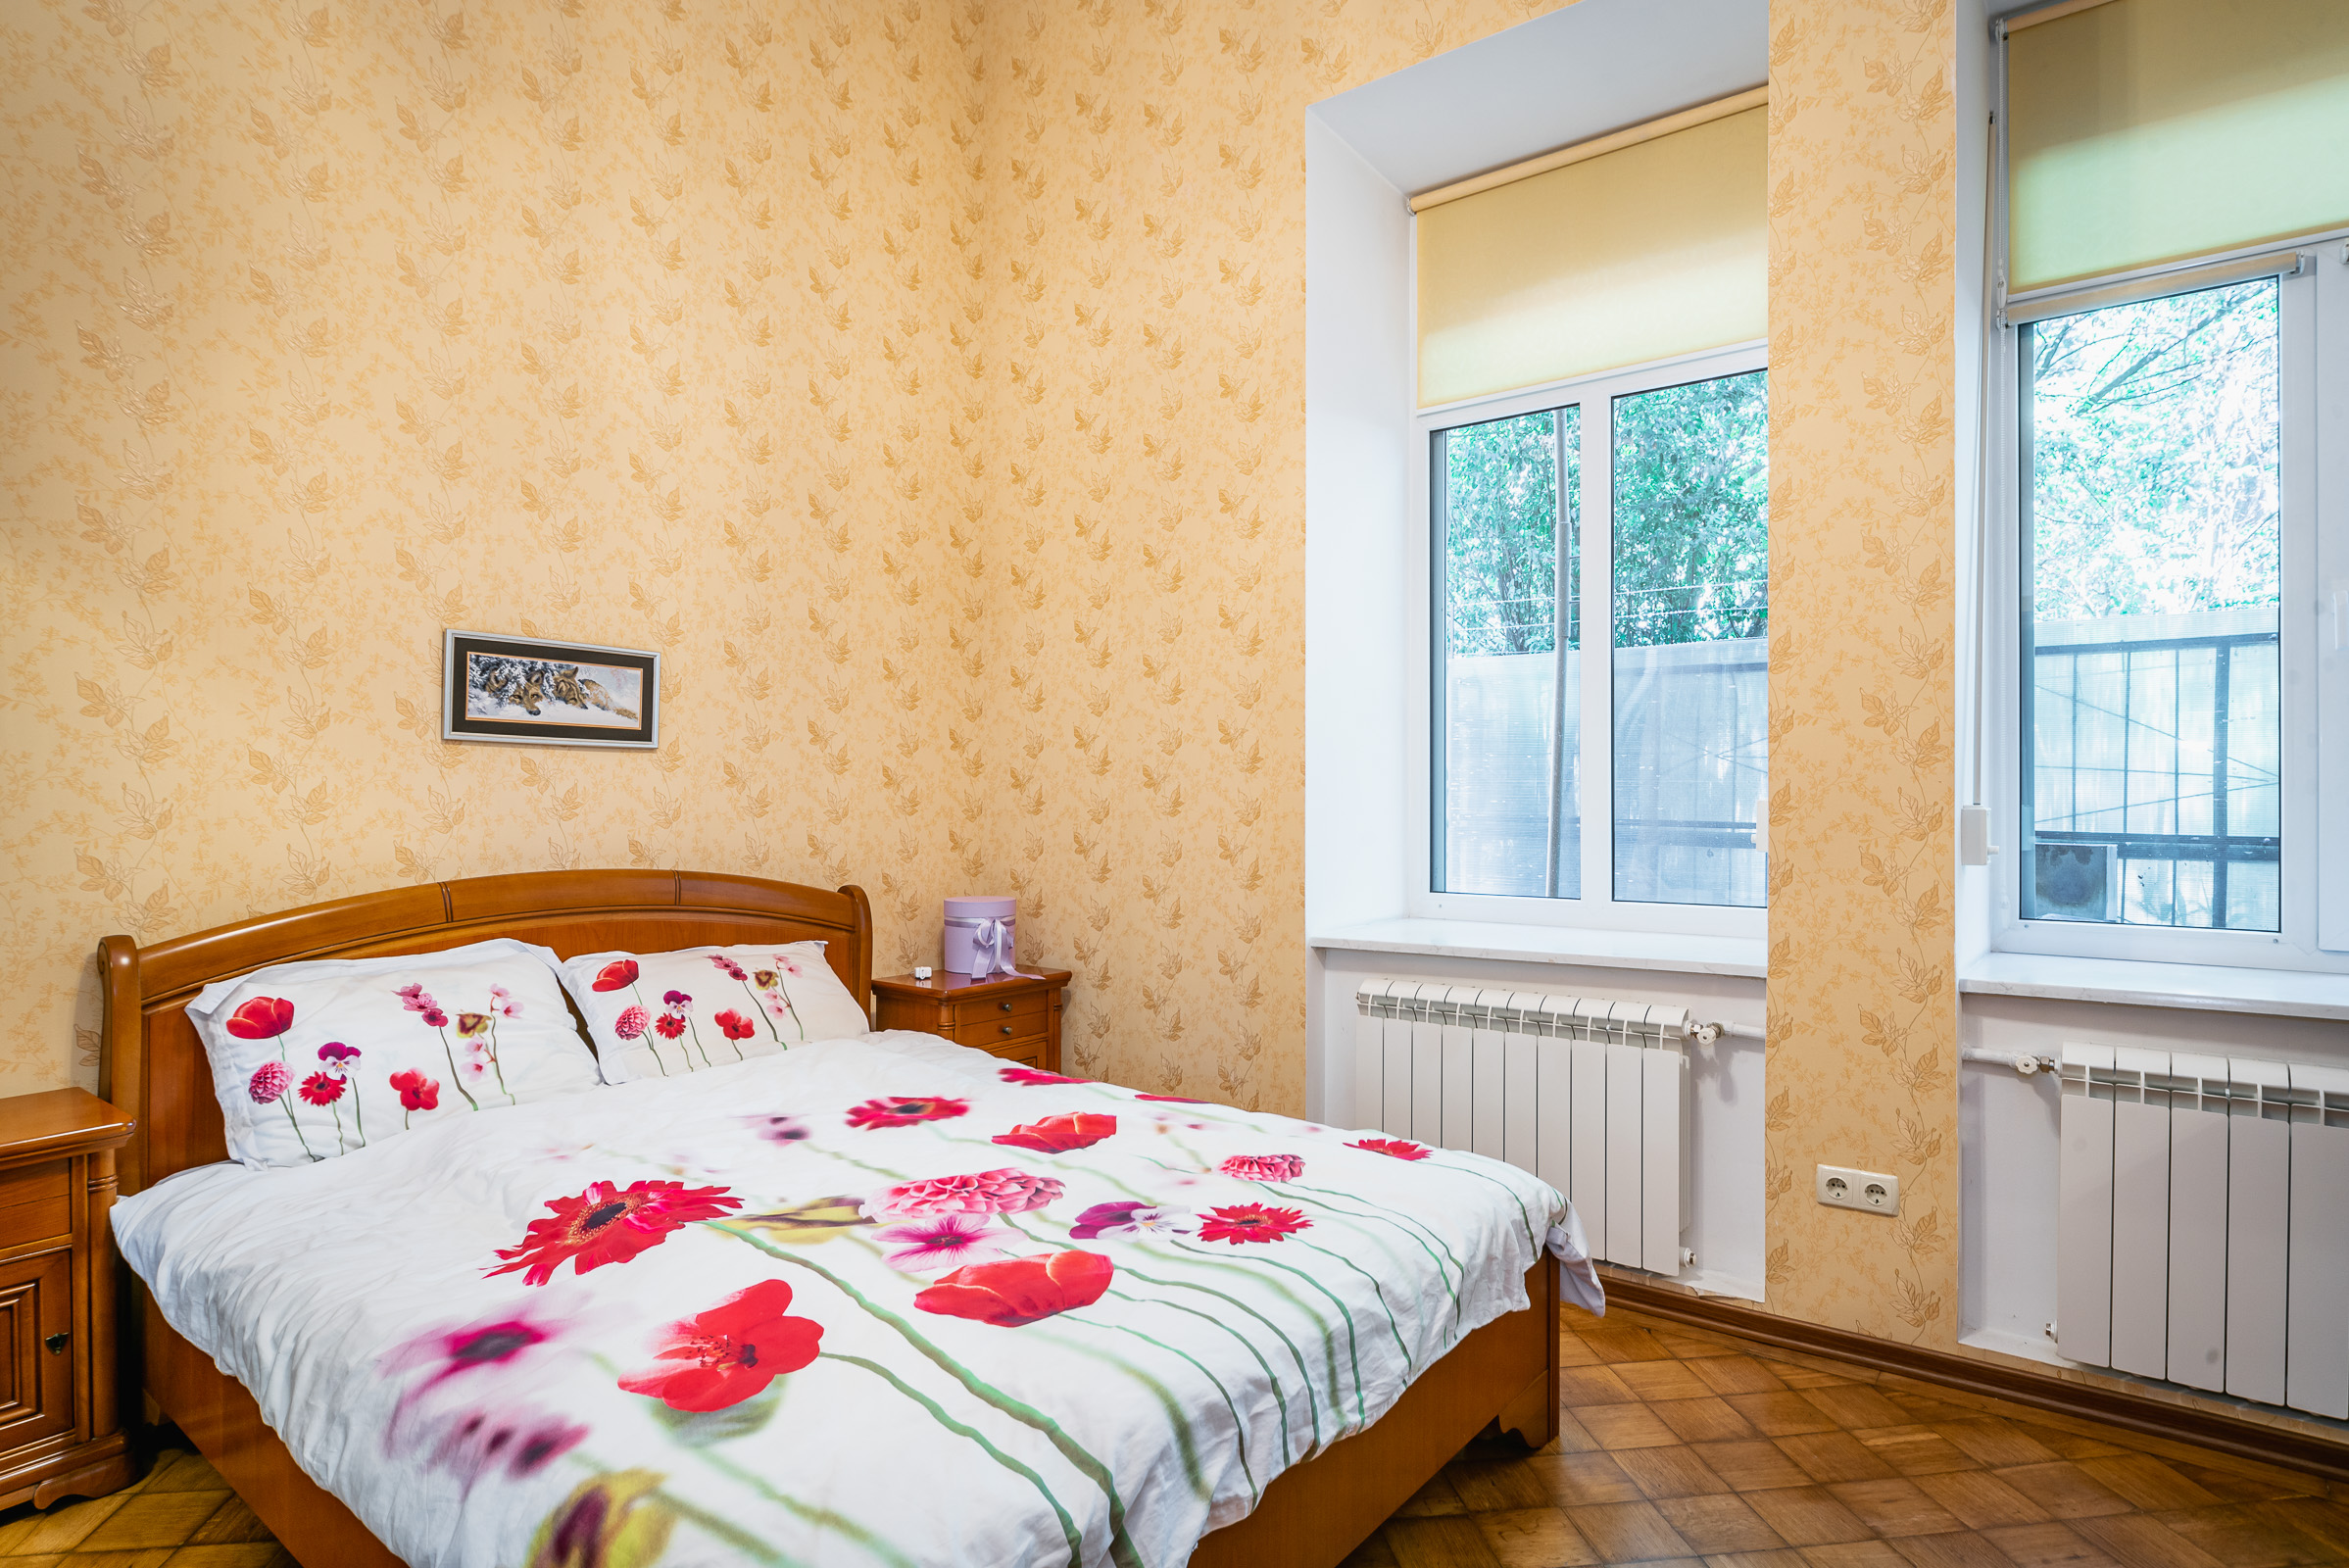 Квартира в историческом доме 18